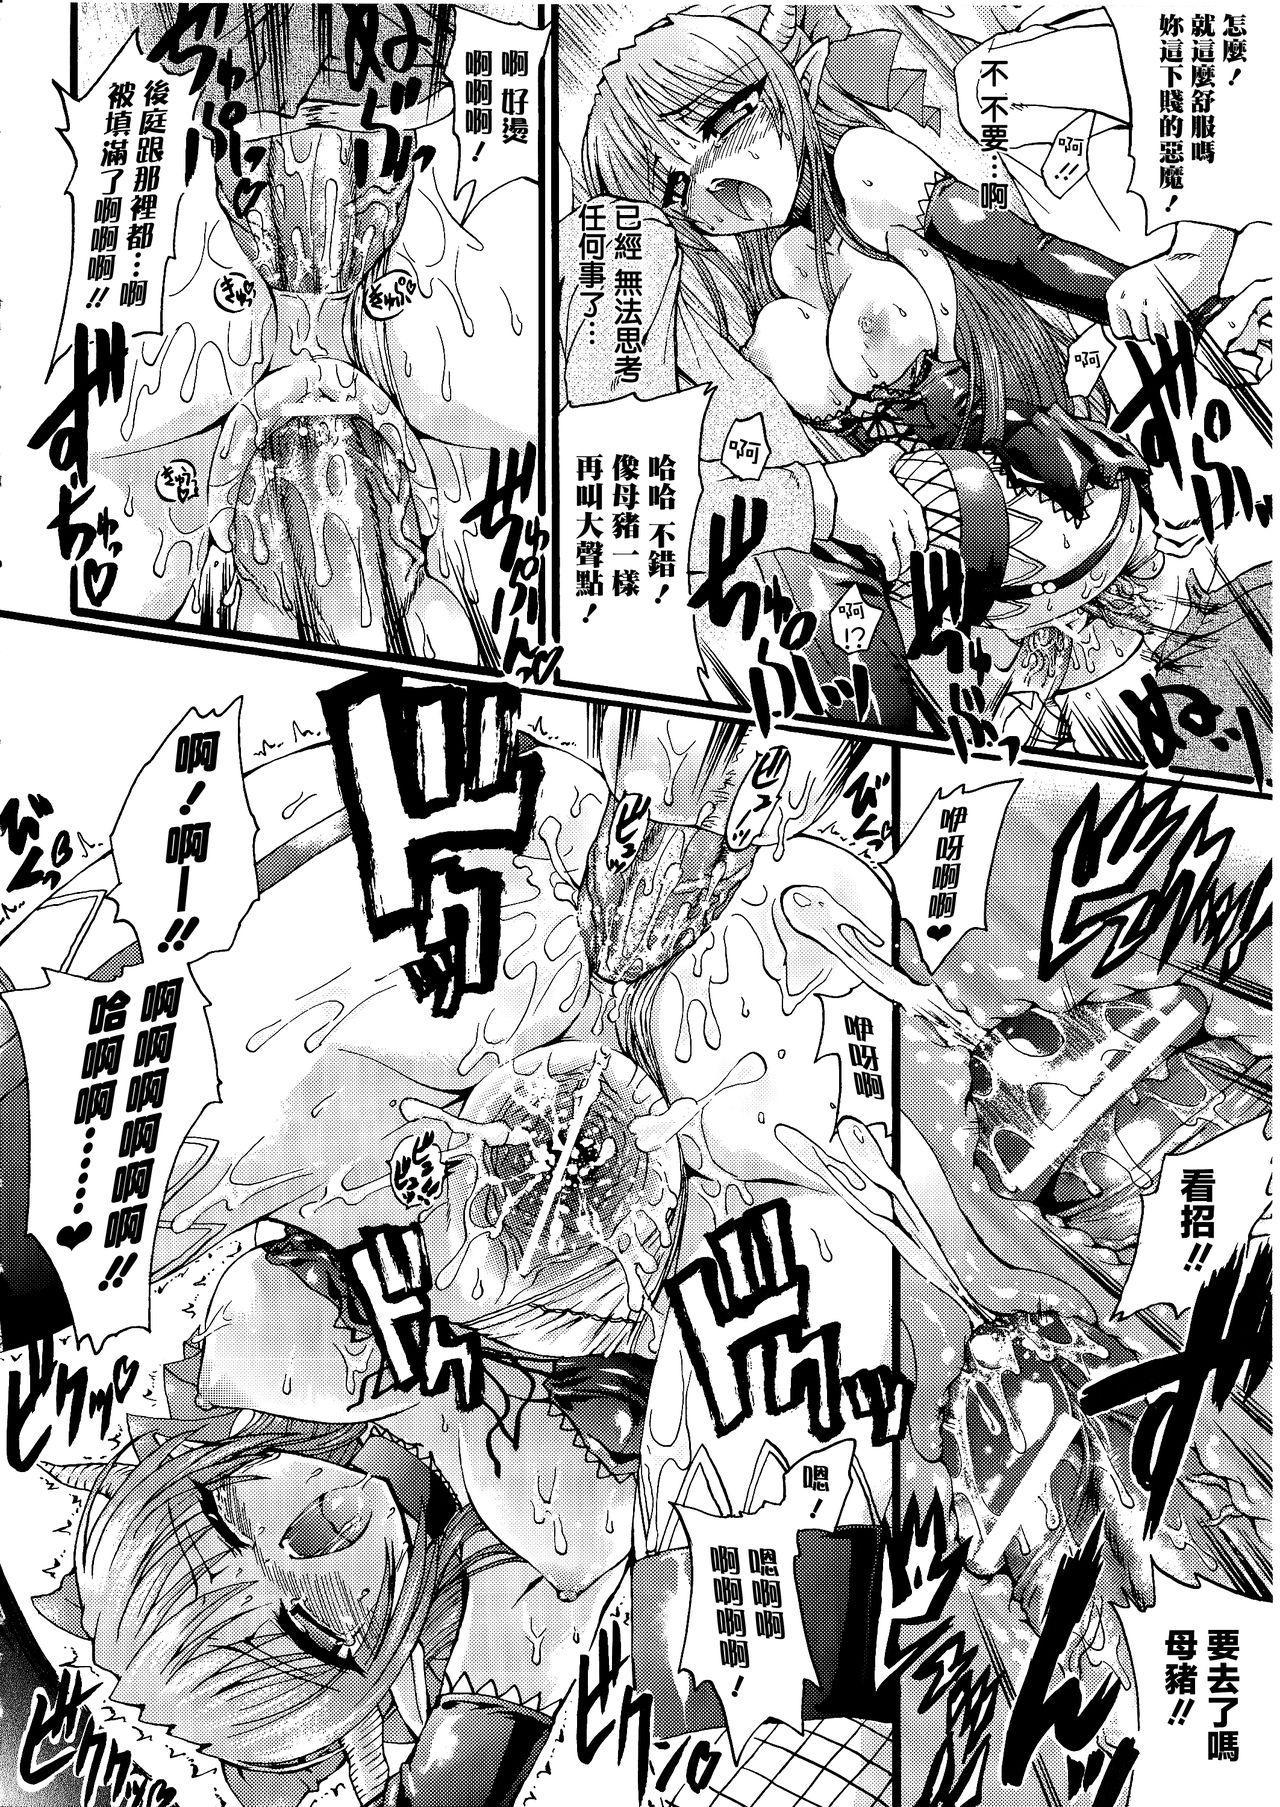 Ma ga Ochiru Yoru Demonic Imitator CH.1-7 40